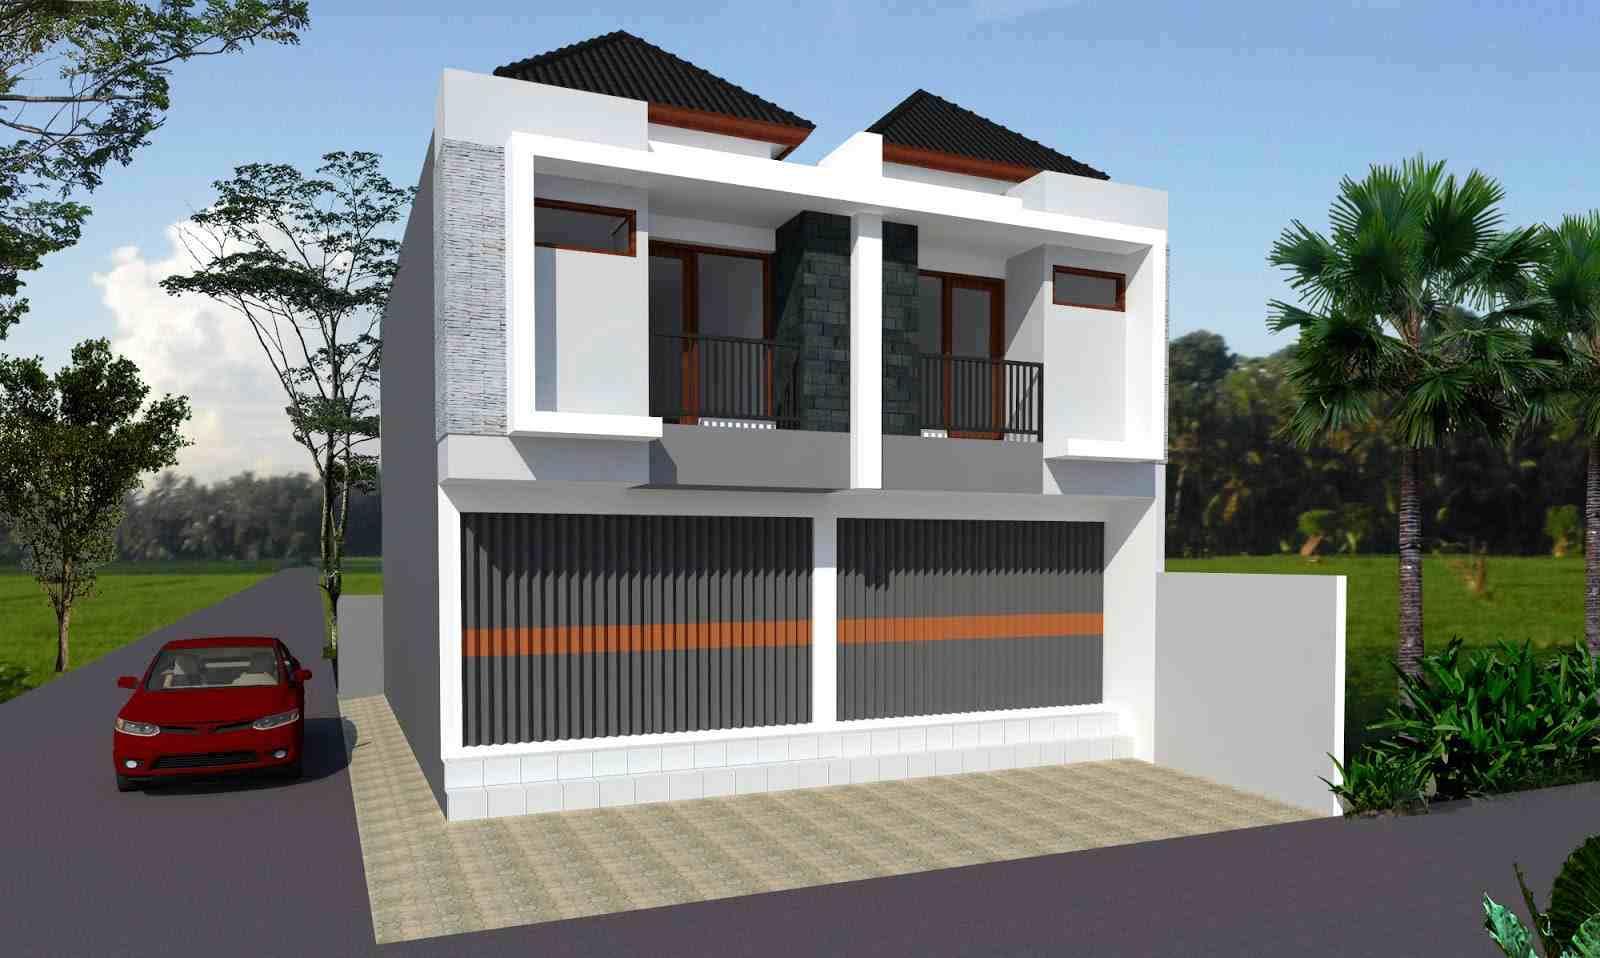 30 Reka bentuk rumah moden sebagai inspirasi untuk anda (2)